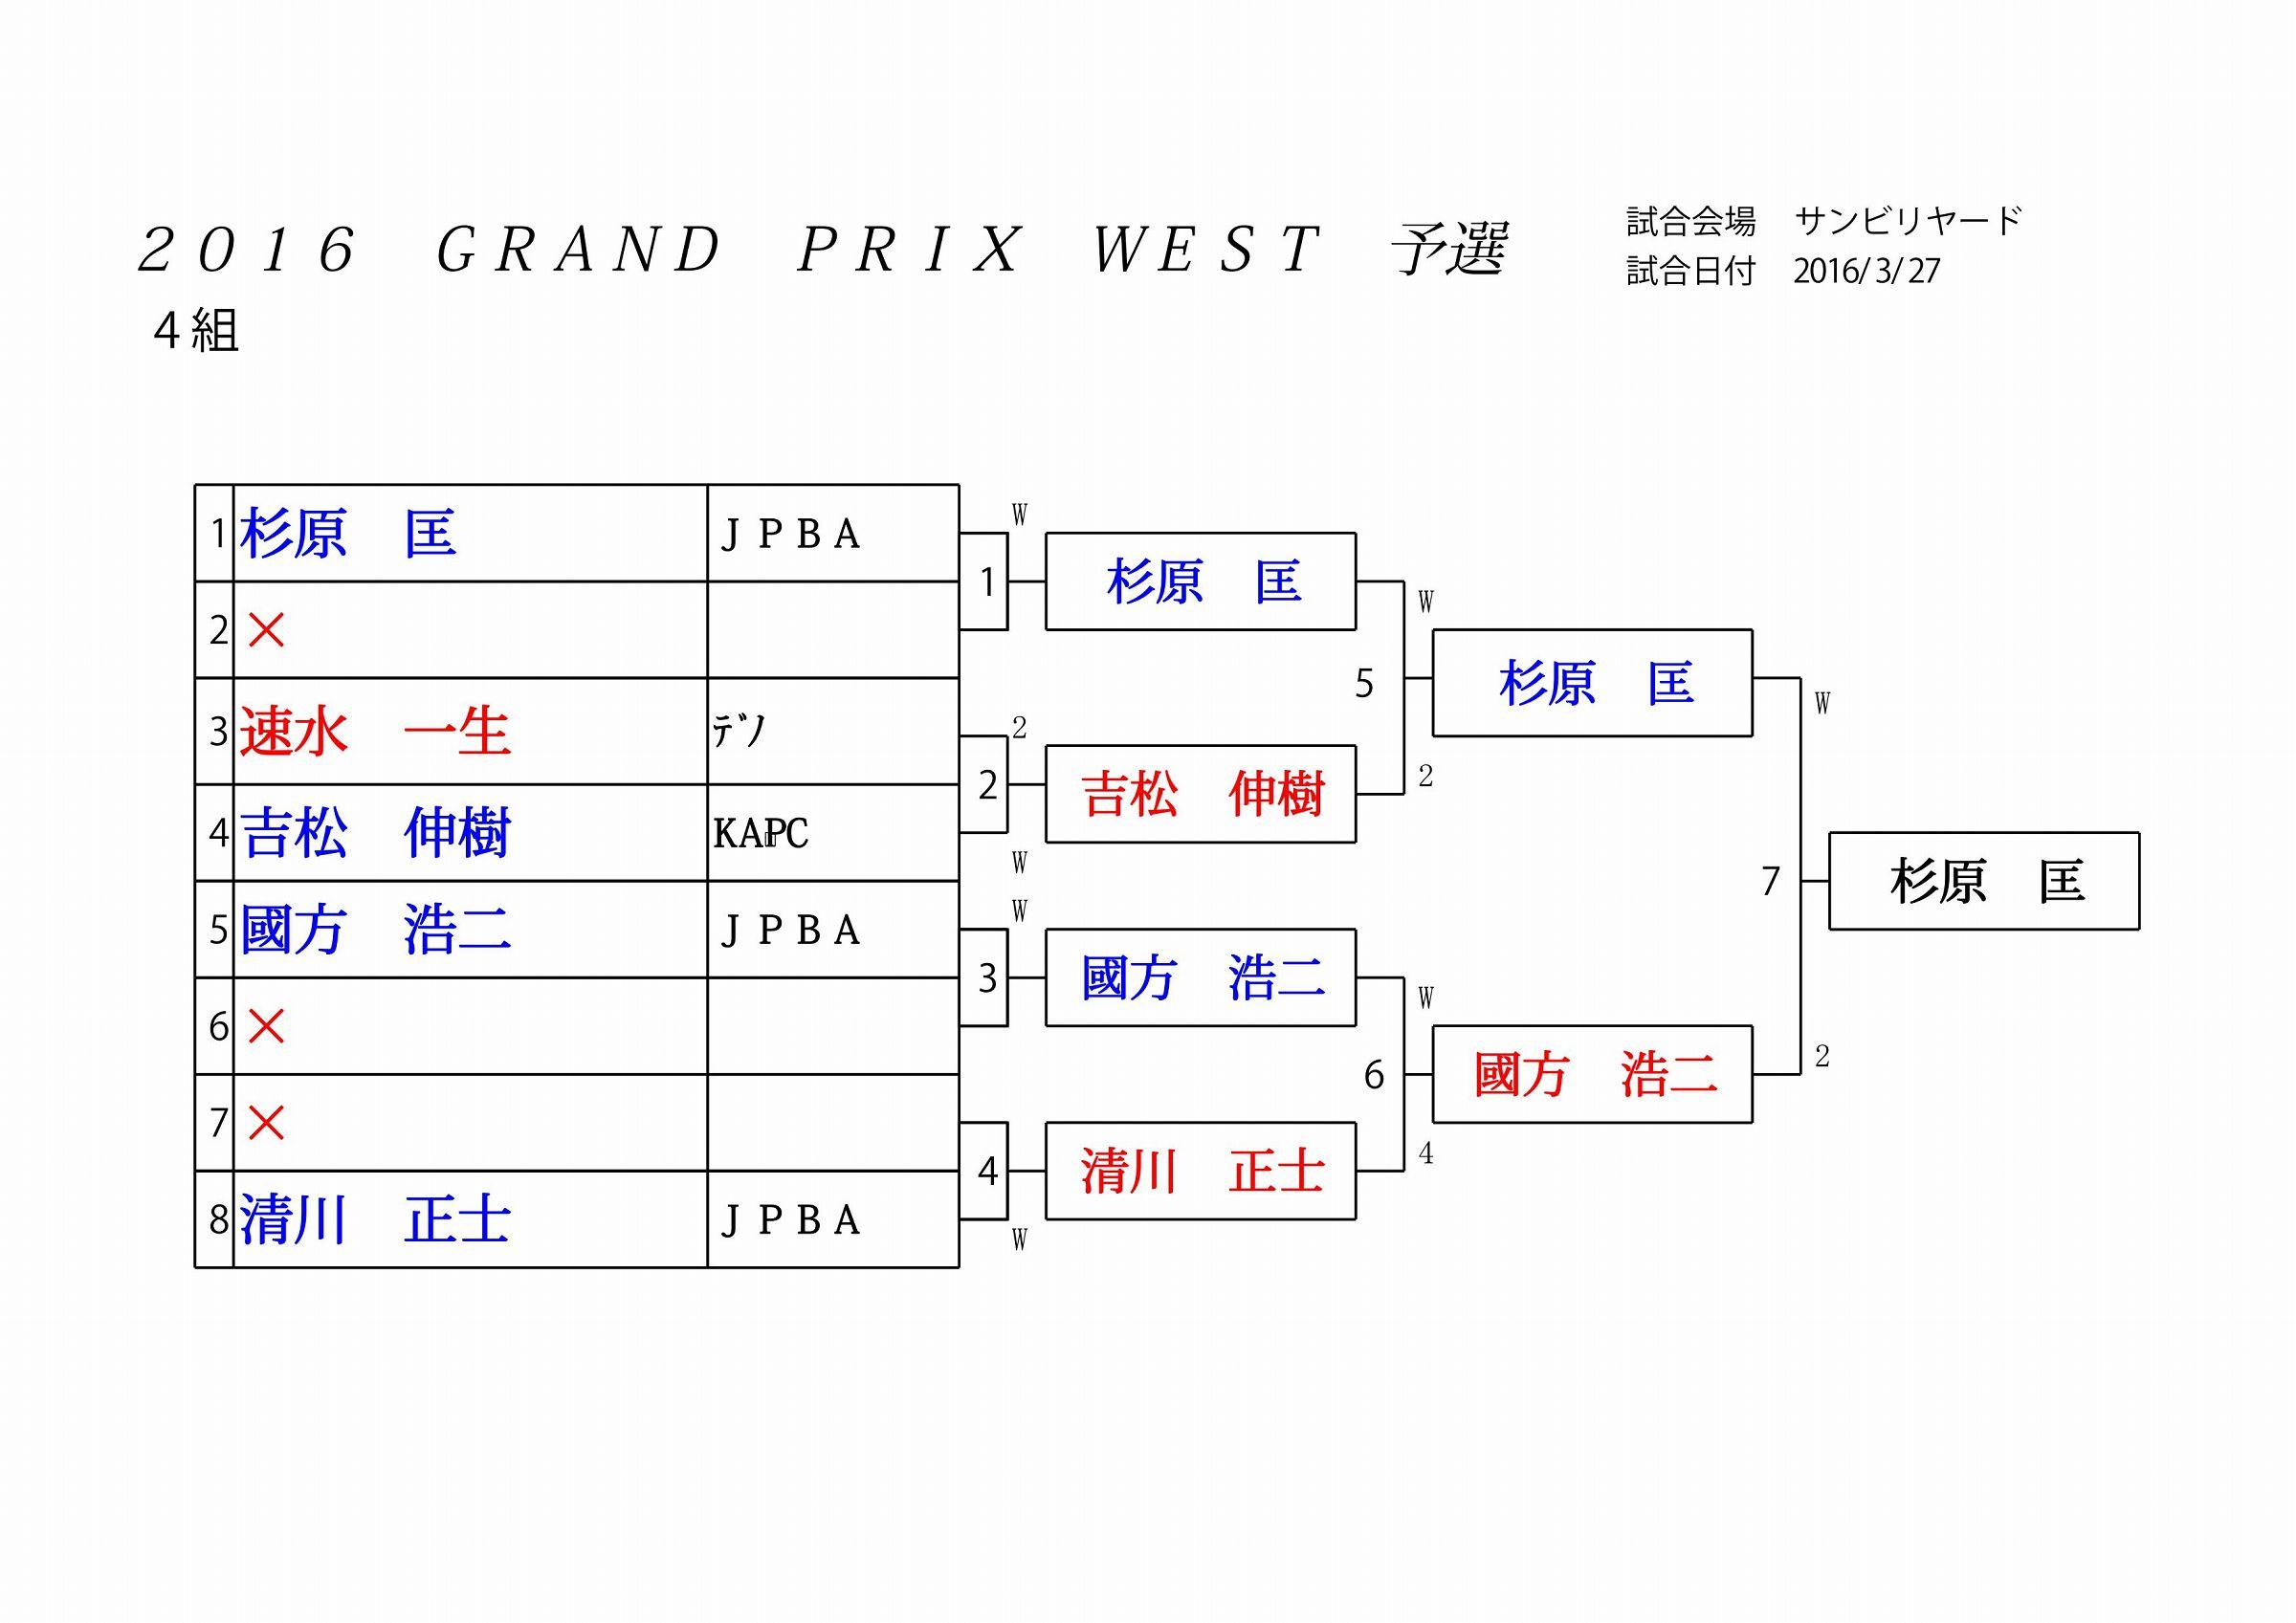 2016 GRAND PRIX WEST 予選_04